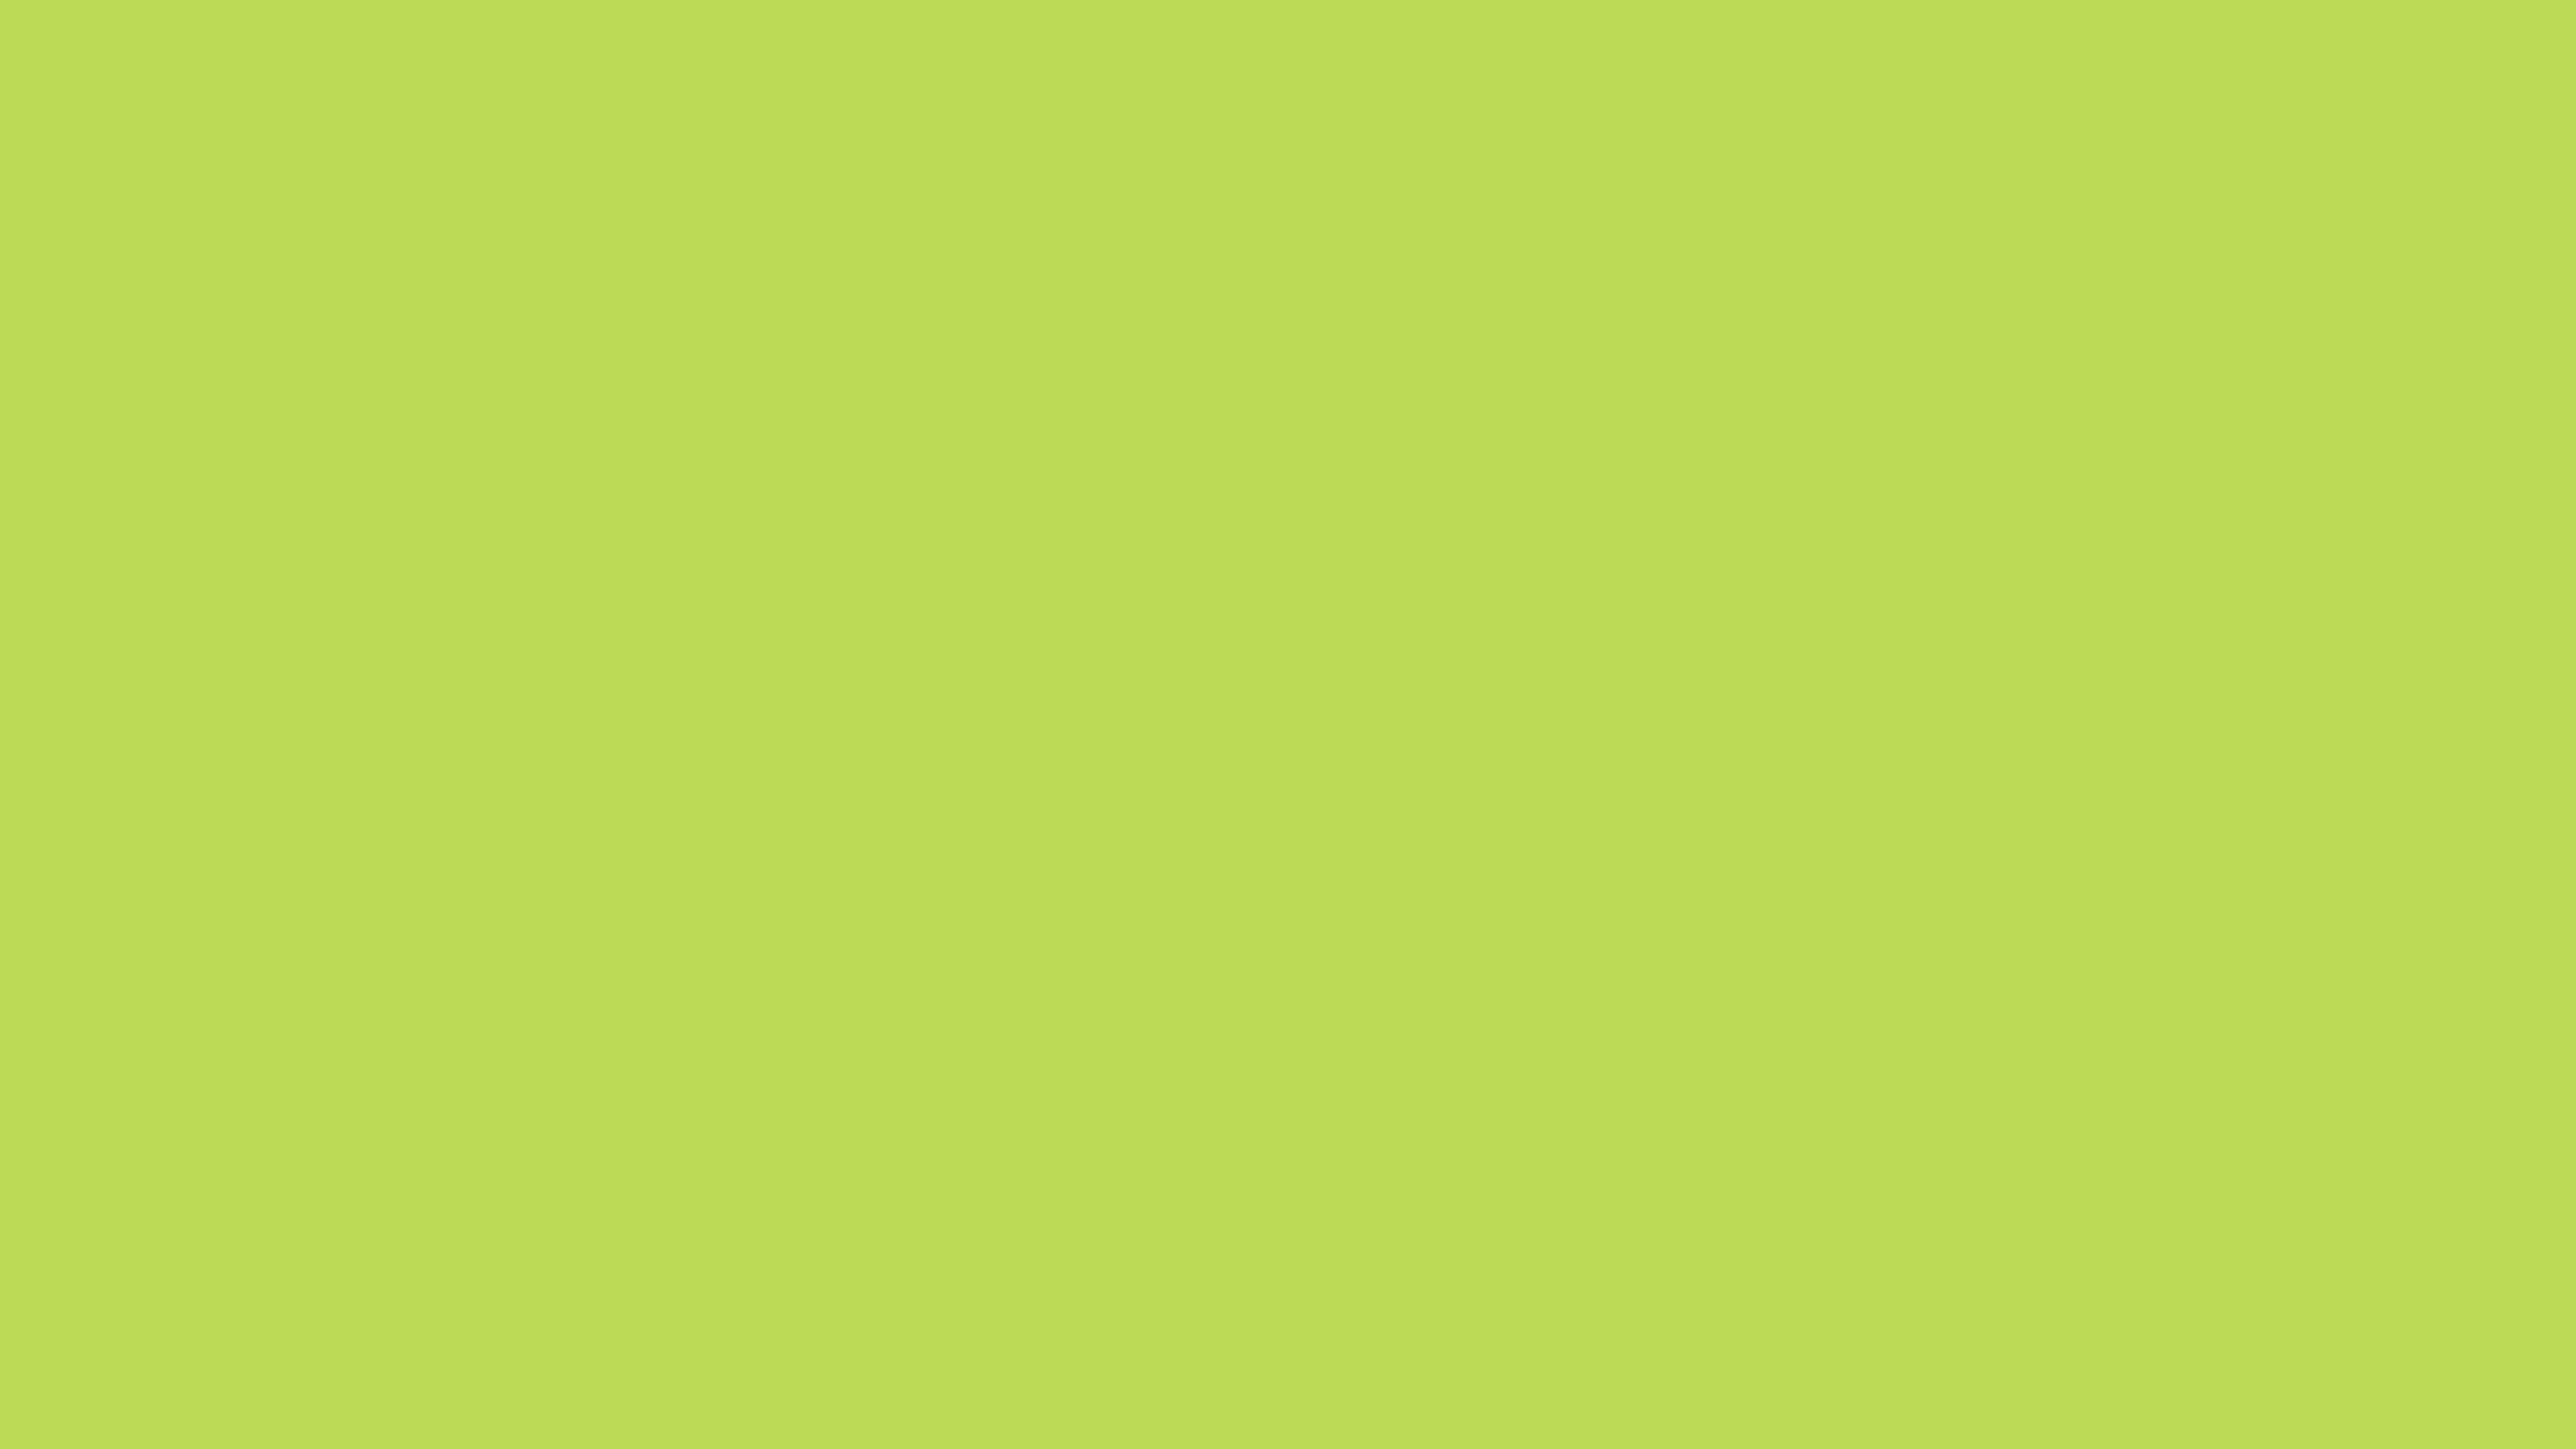 4096x2304 June Bud Solid Color Background